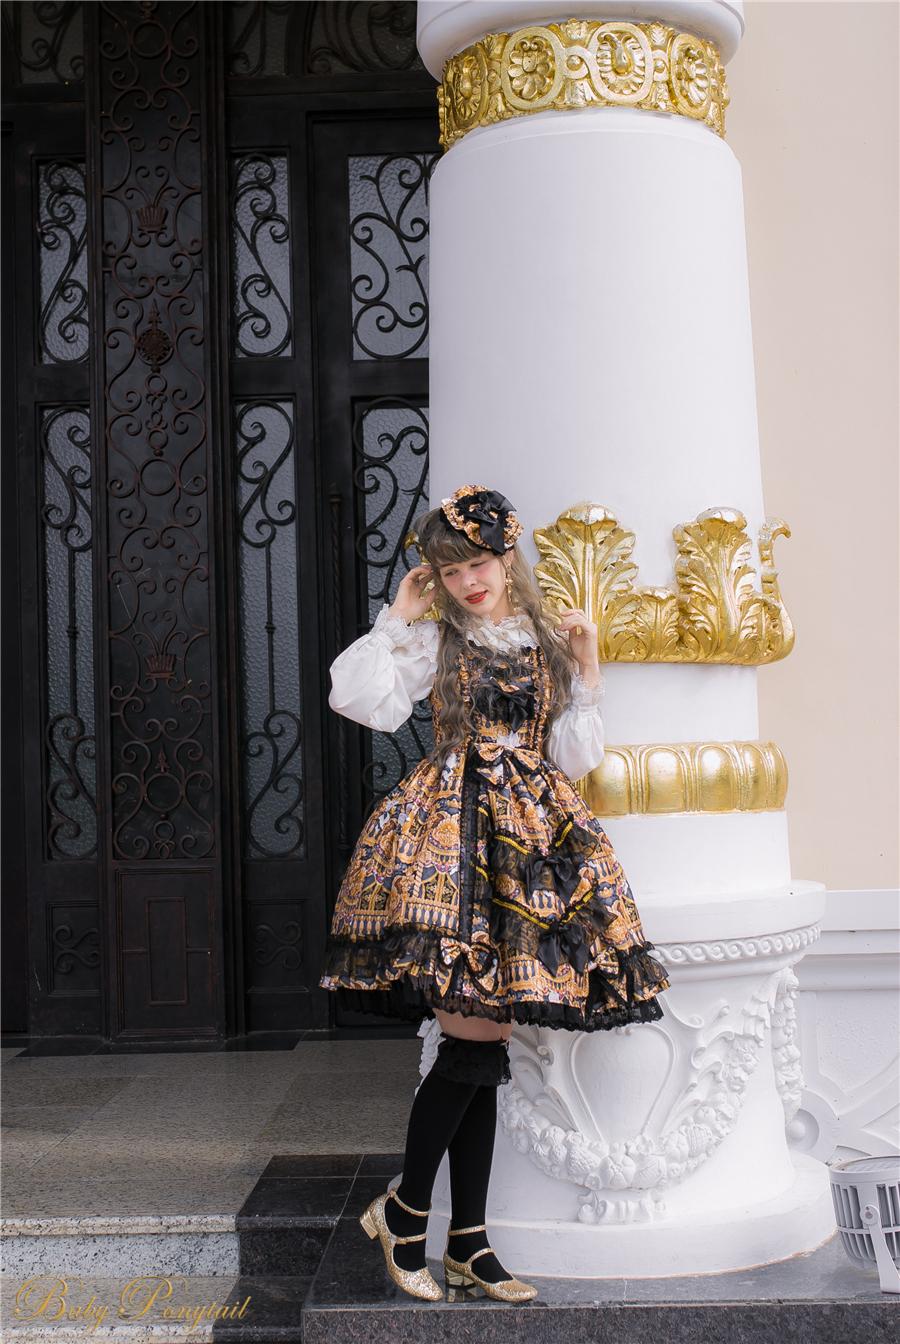 Babyponytail_Model_JSK_Black Present Angel_Claudia_2_0.jpg